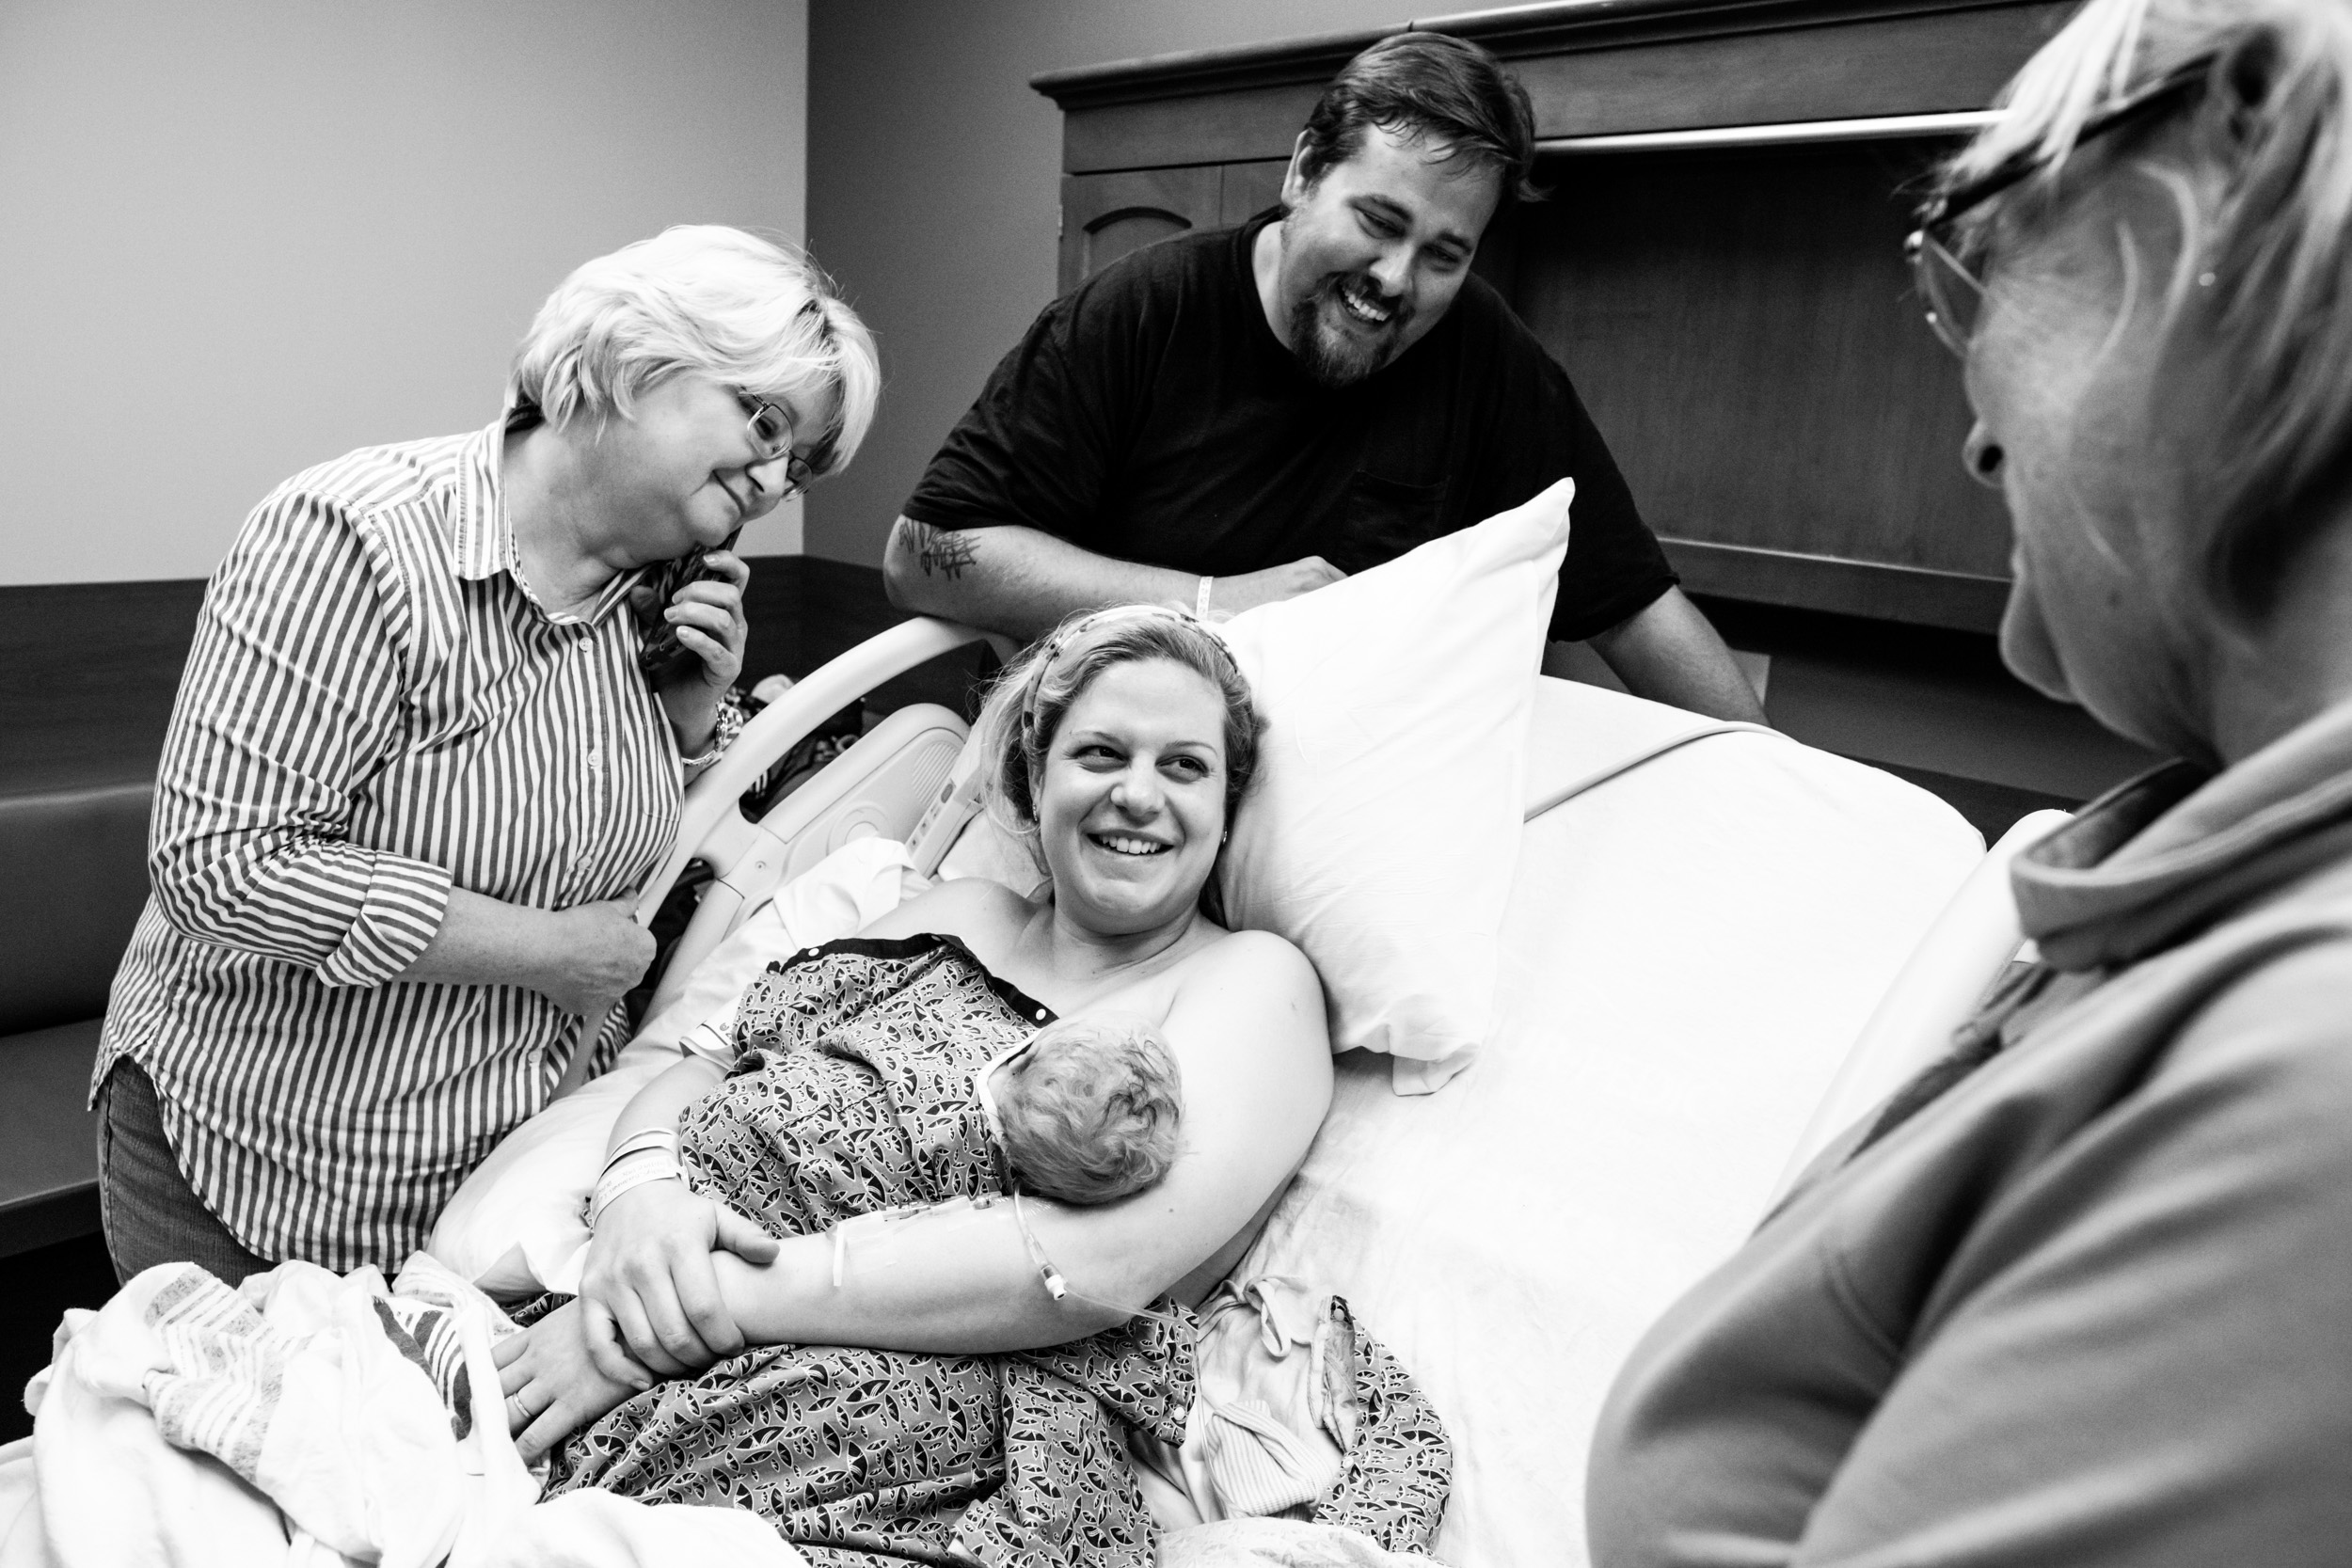 jacksonville-birth-photographer-ss-85.jpg